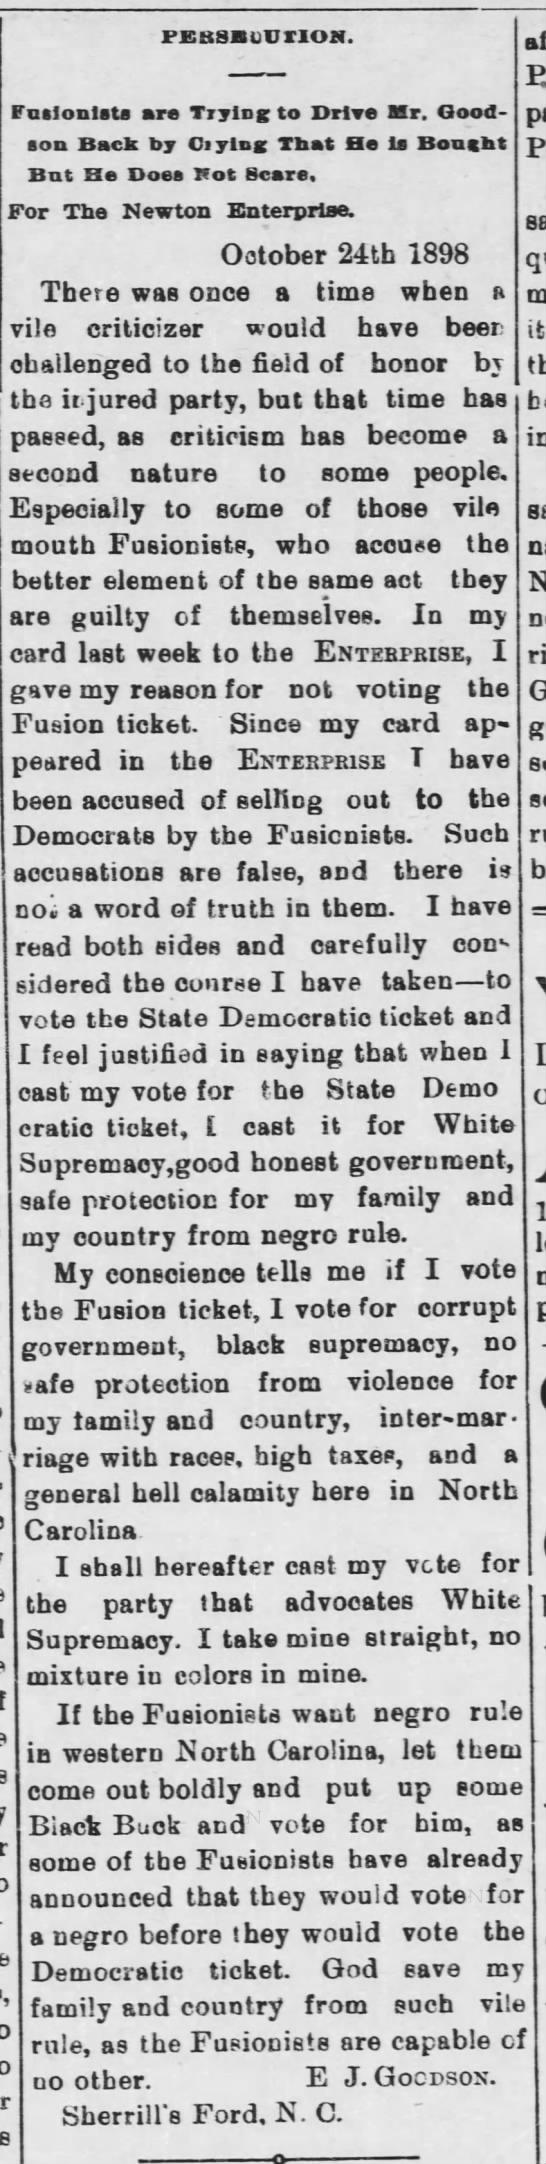 Goodson, E.J. - letter to The Newton Enterprise 28 Oct 1898 -